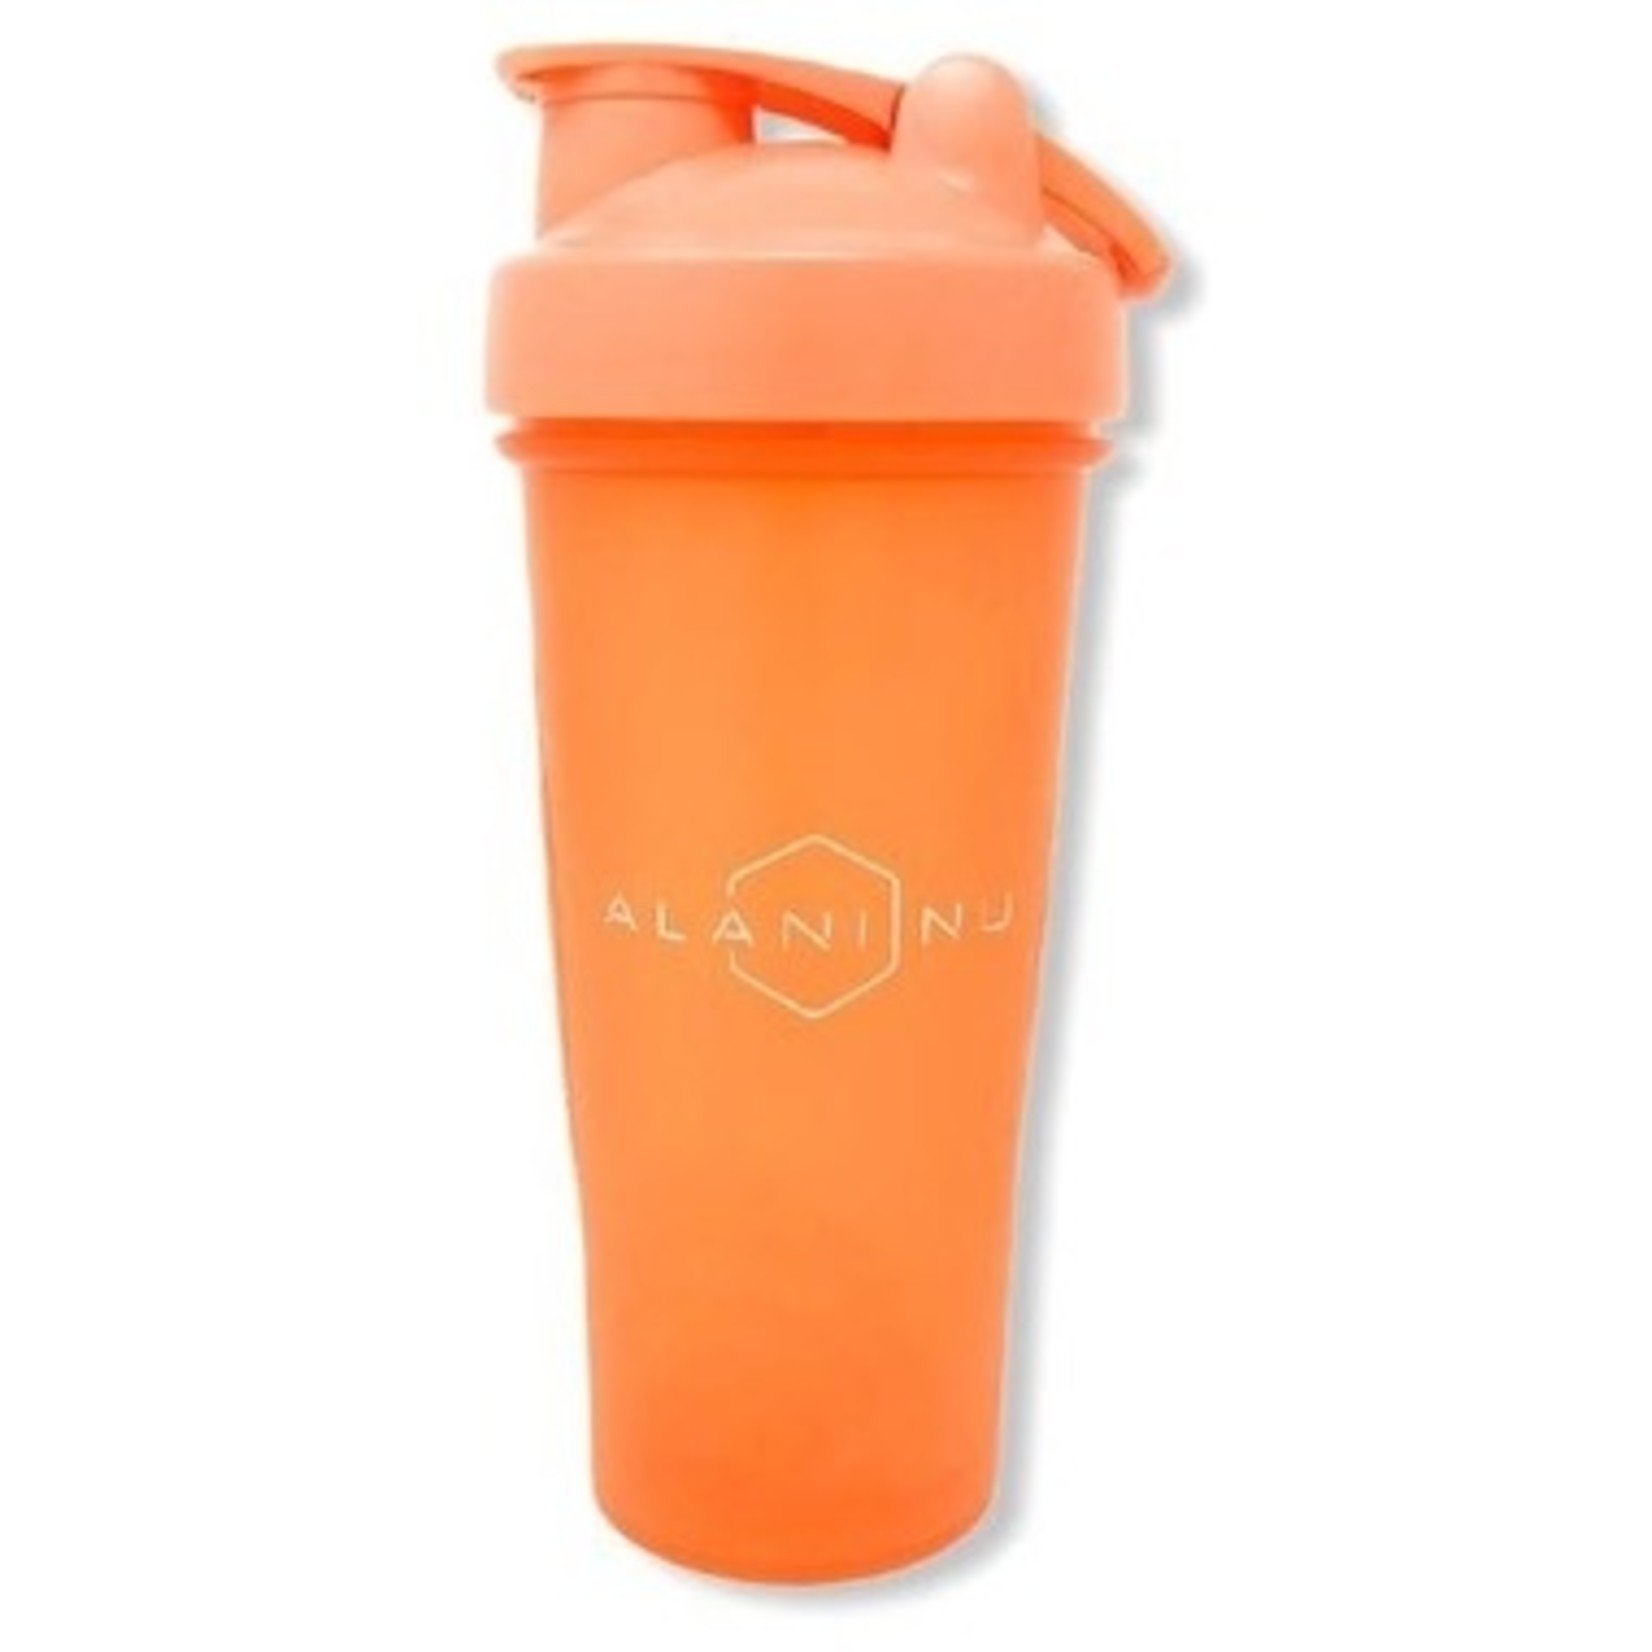 Alani Nu Alani Nu Shaker Bottle Orange